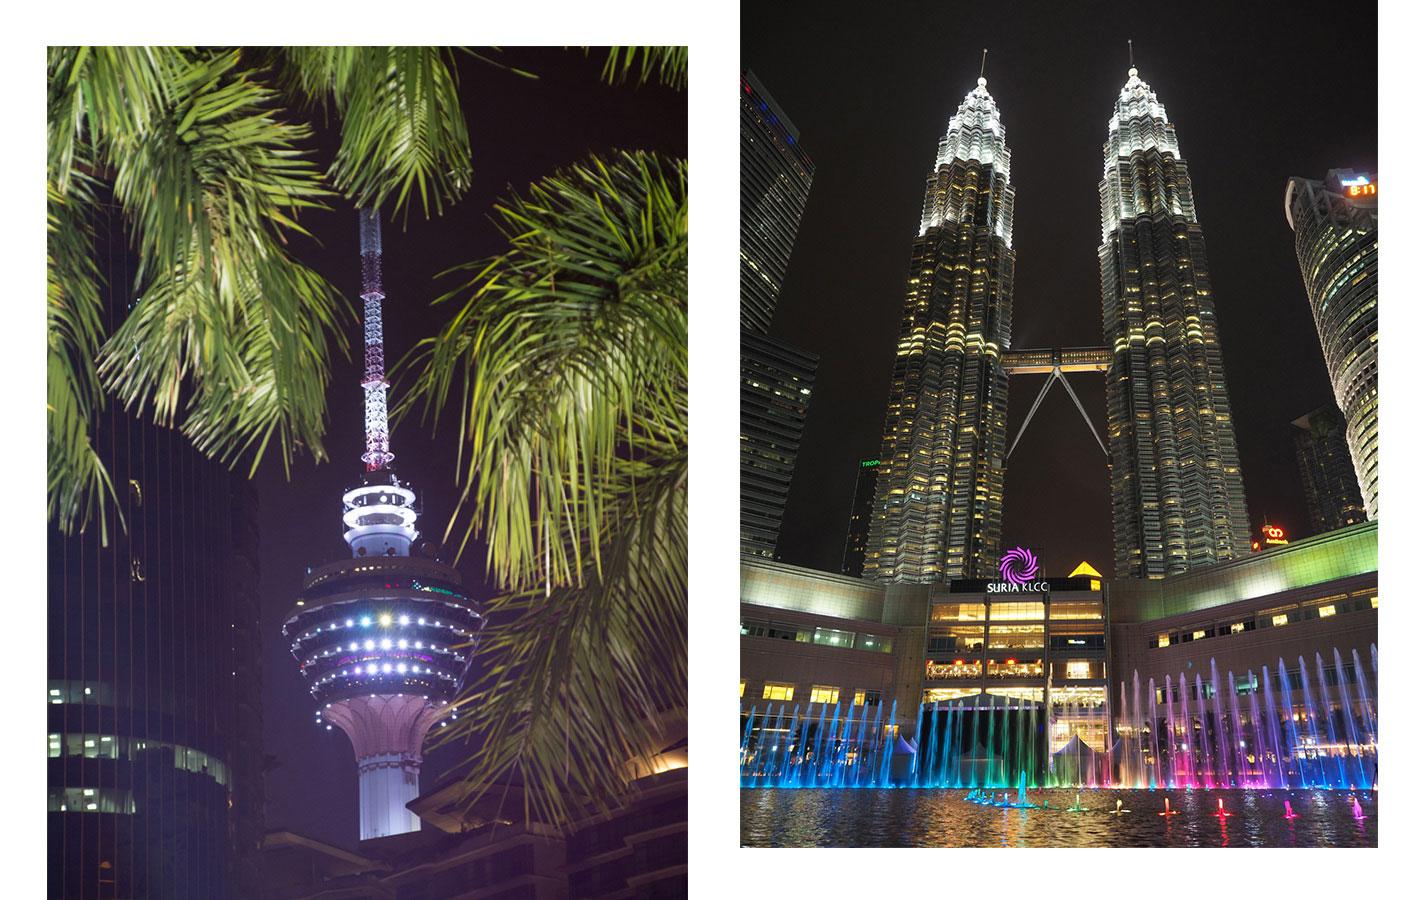 kuala lumpur petronas twin towers 1 - Highlights für einen Stopover in Kuala Lumpur – Was ihr in 24 Stunden unbedingt sehen müsst